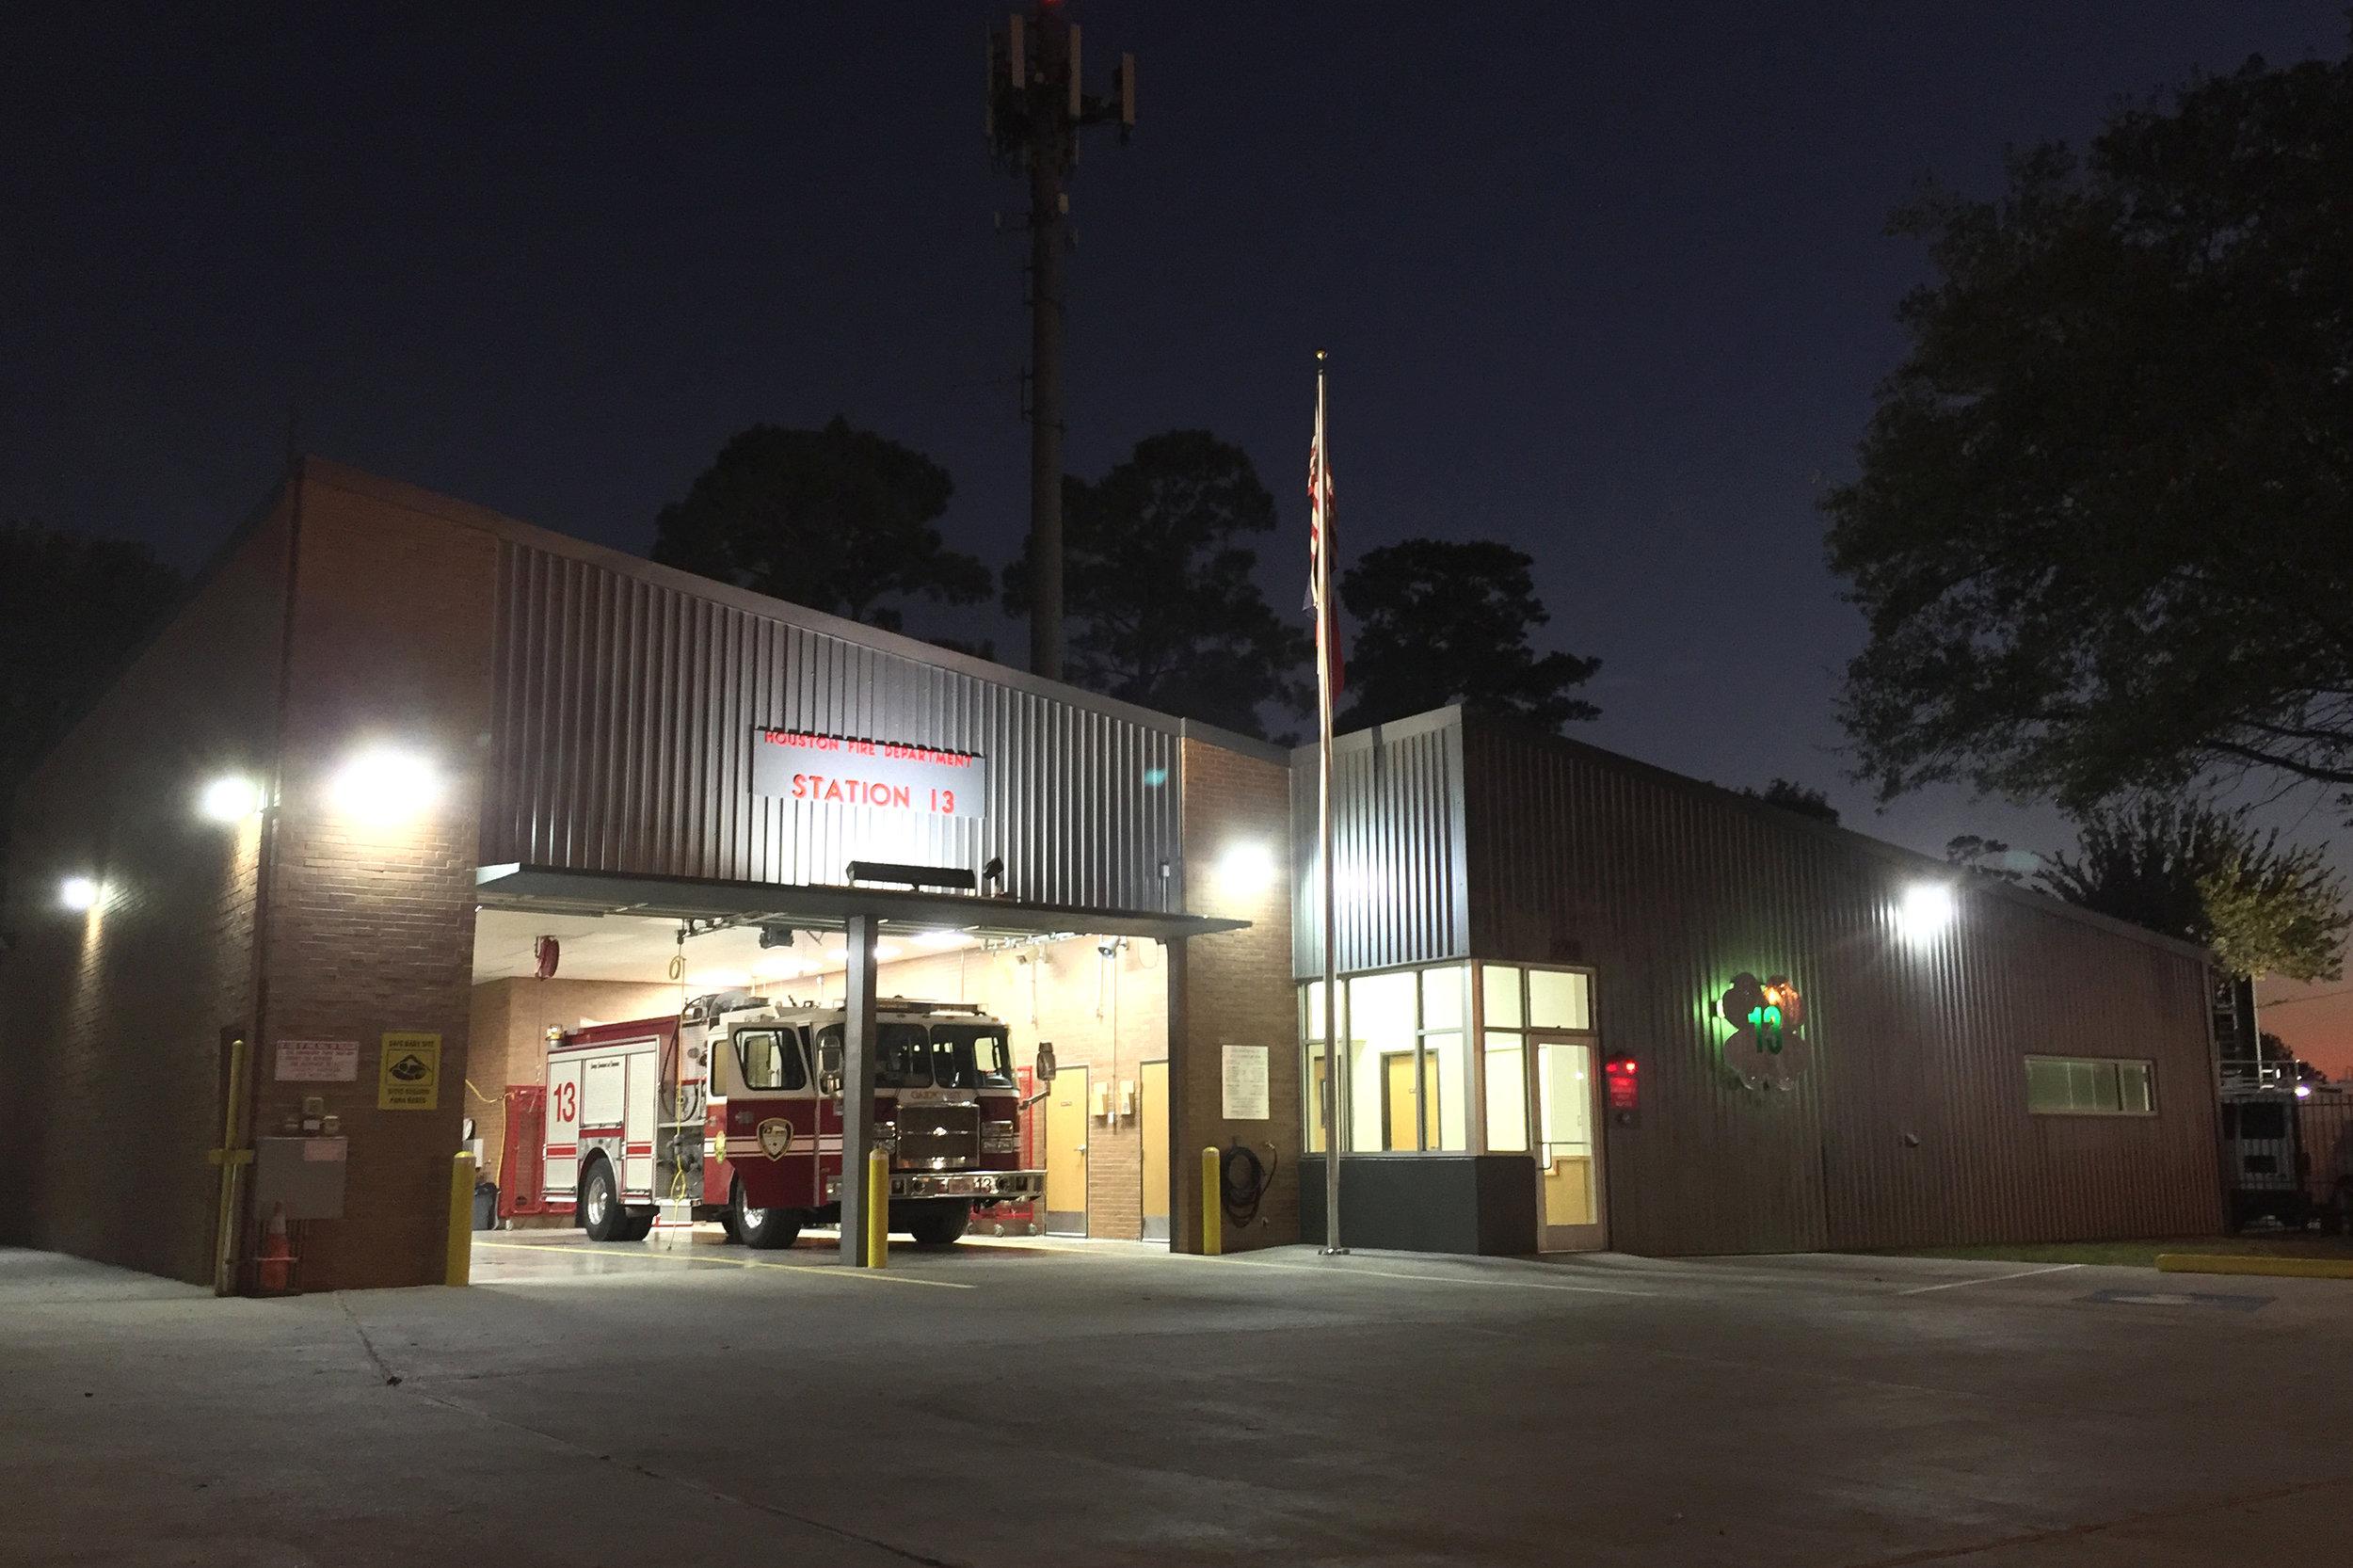 CoH HFD Fire Station 13_03.jpg